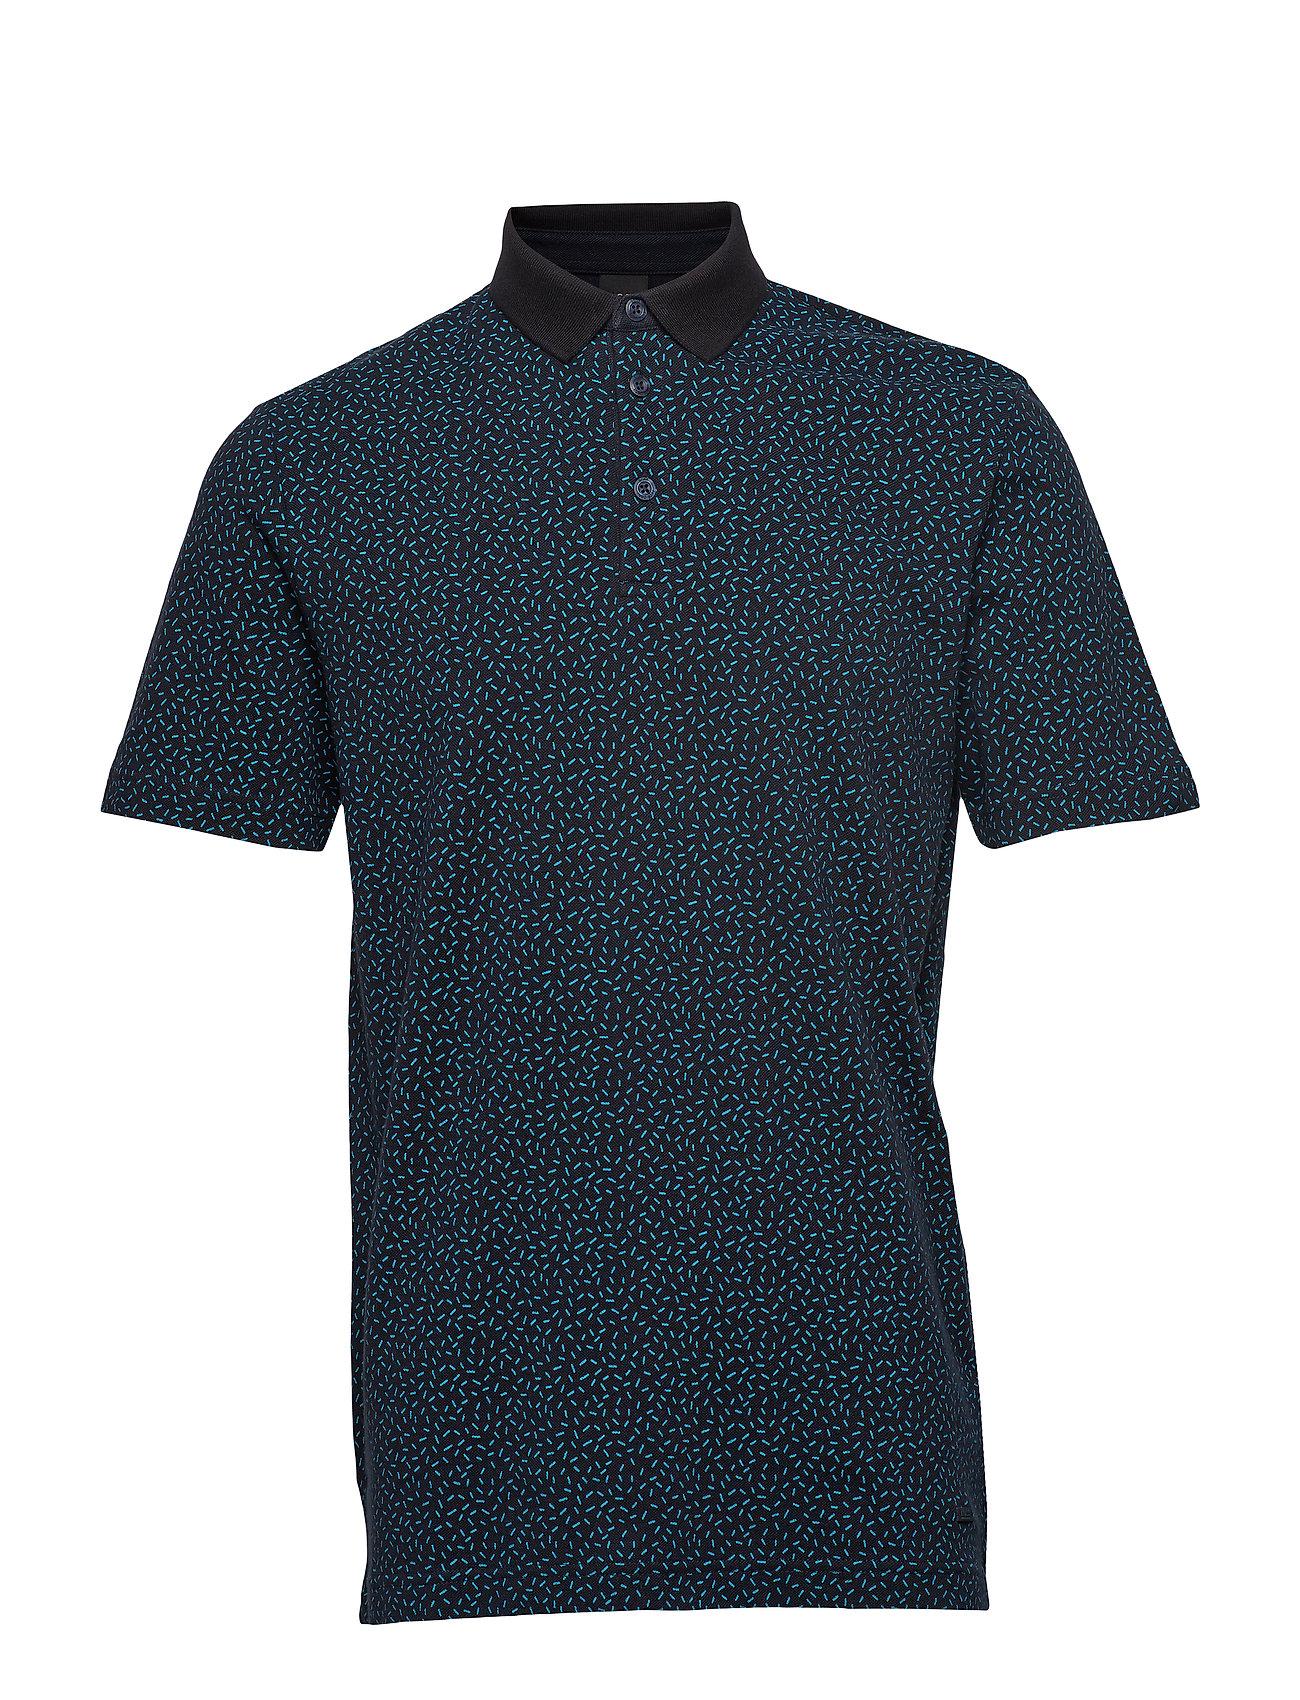 Boss Casual Wear Pattman - DARK BLUE